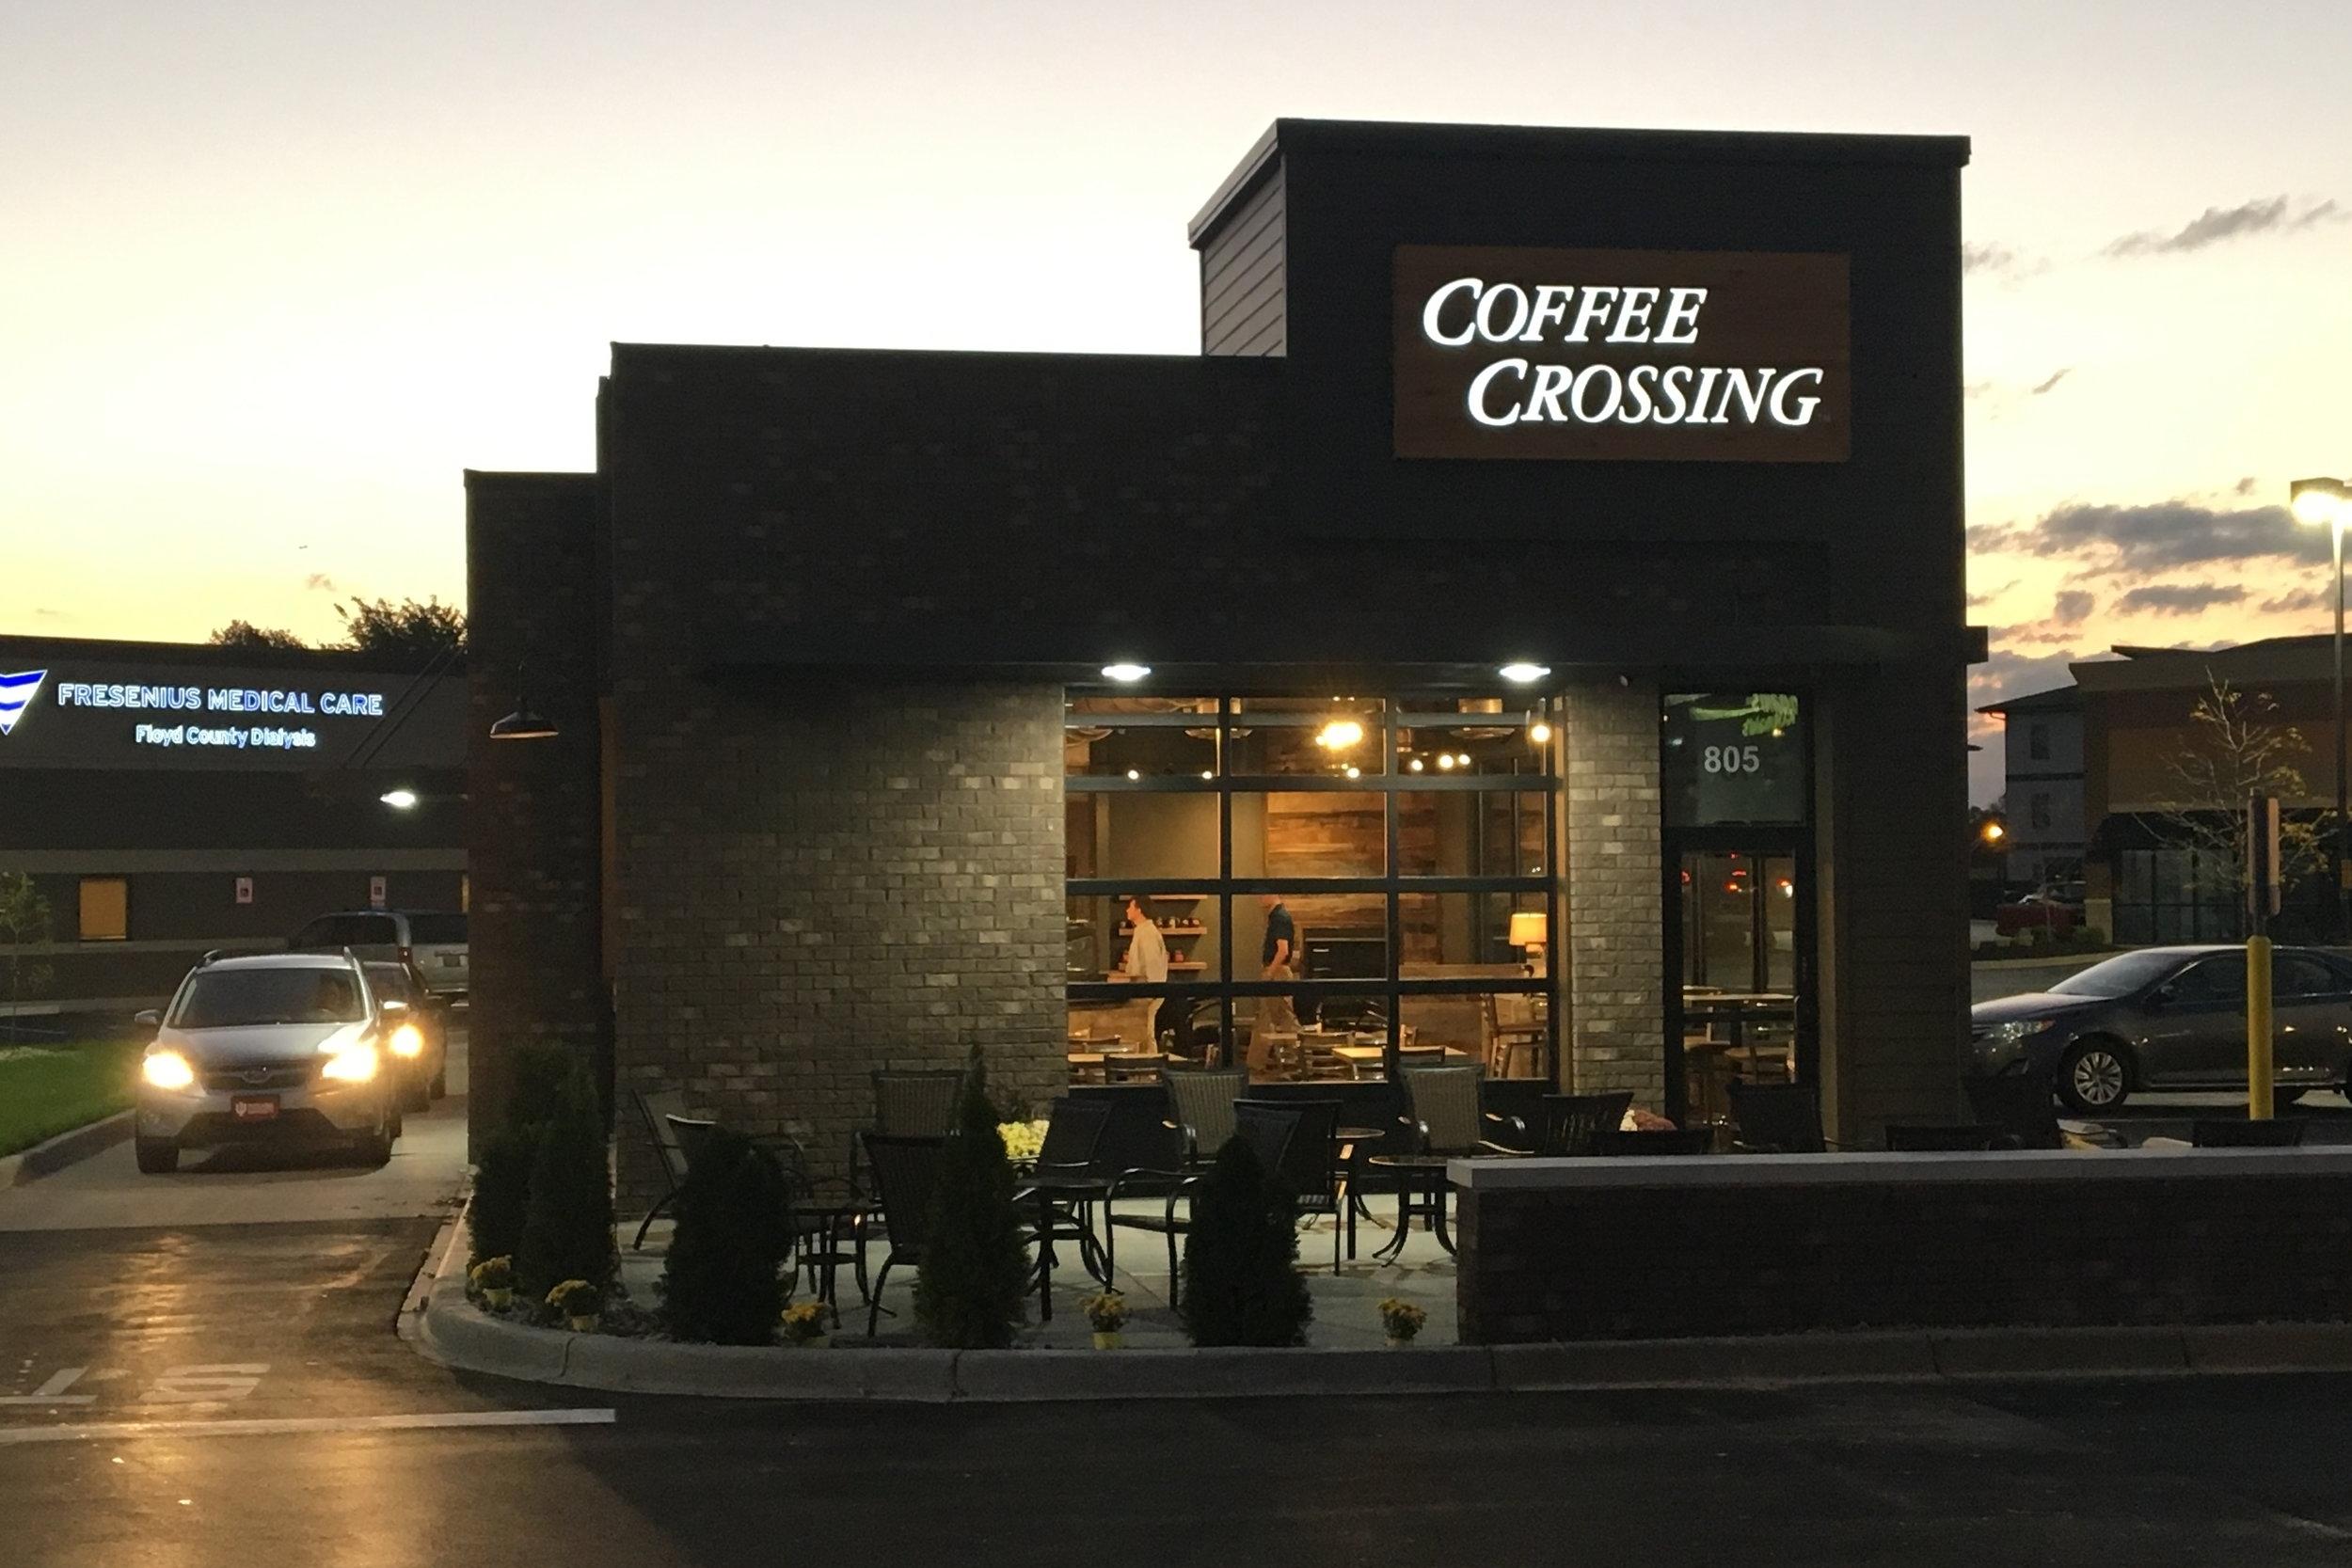 Coffee Crossing